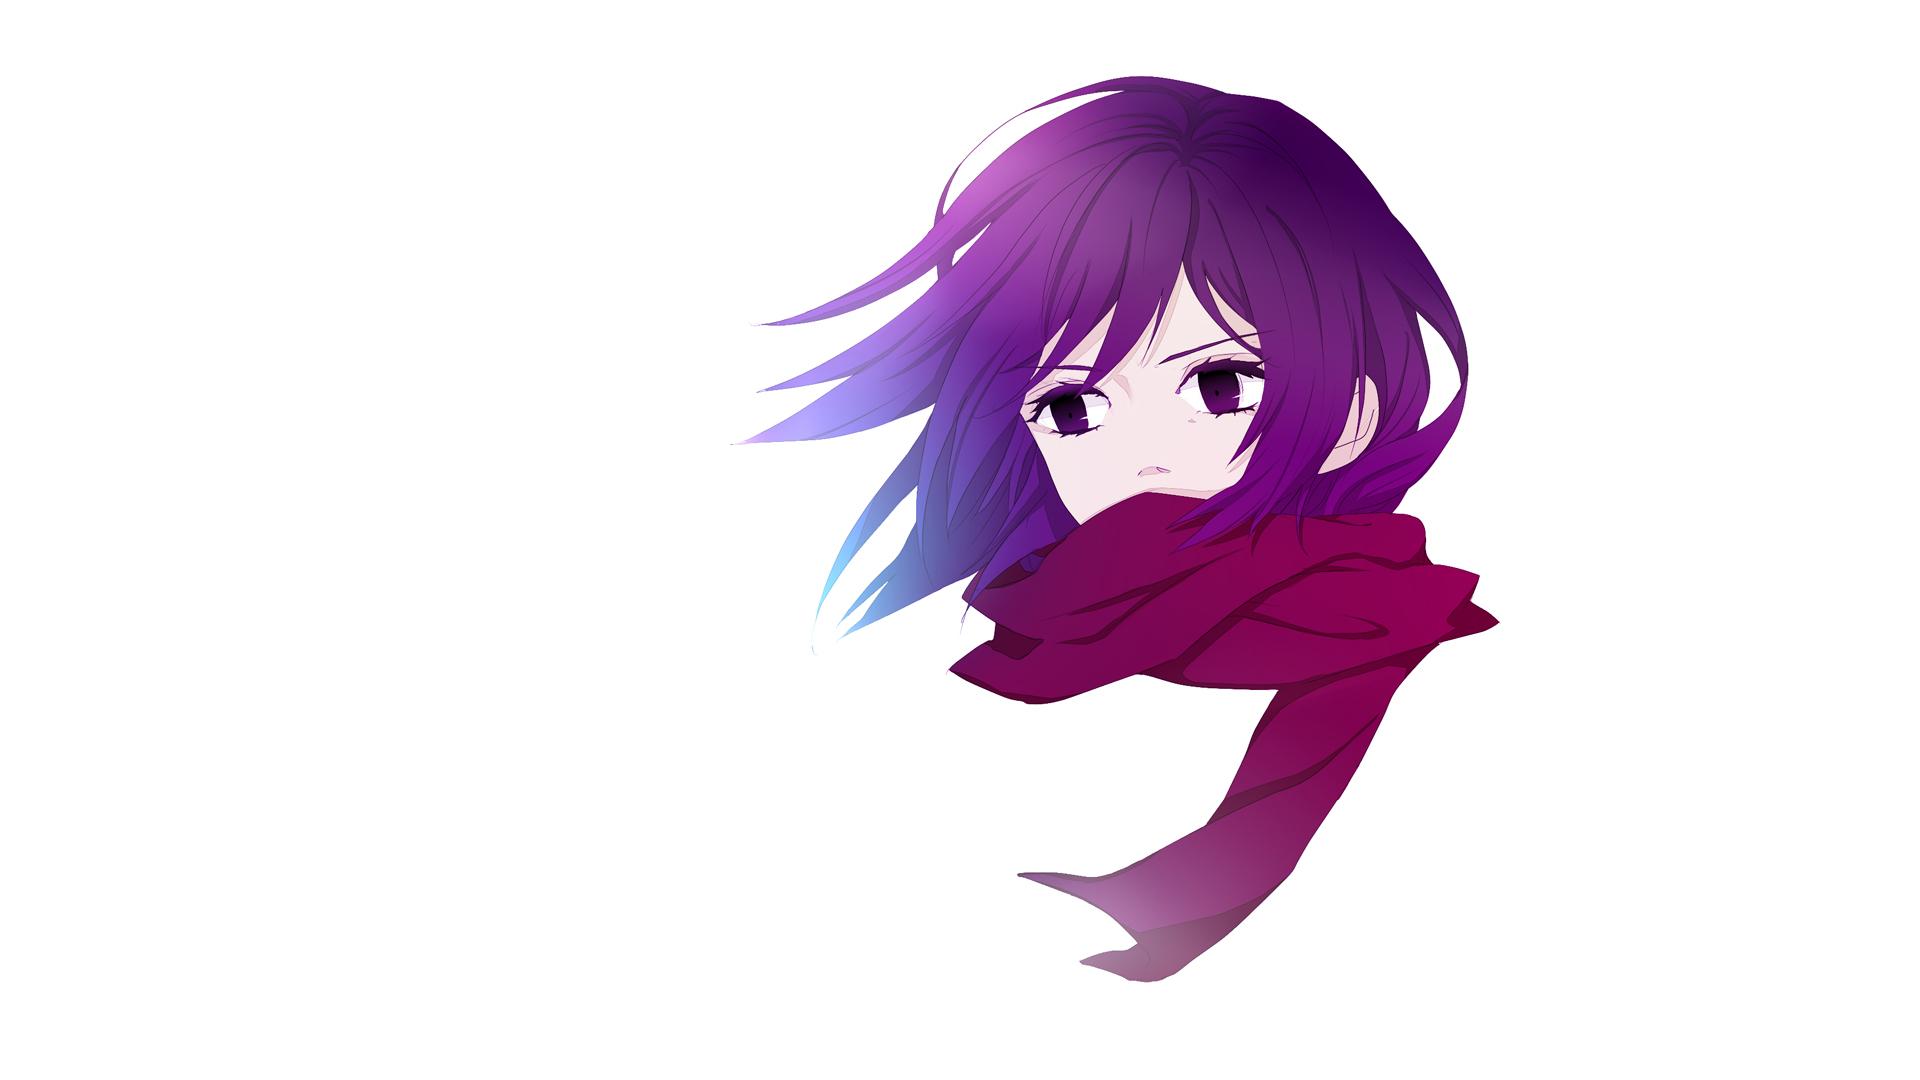 Wallpaper Mikasa Ackerman, Attack on titan, anime girl, face